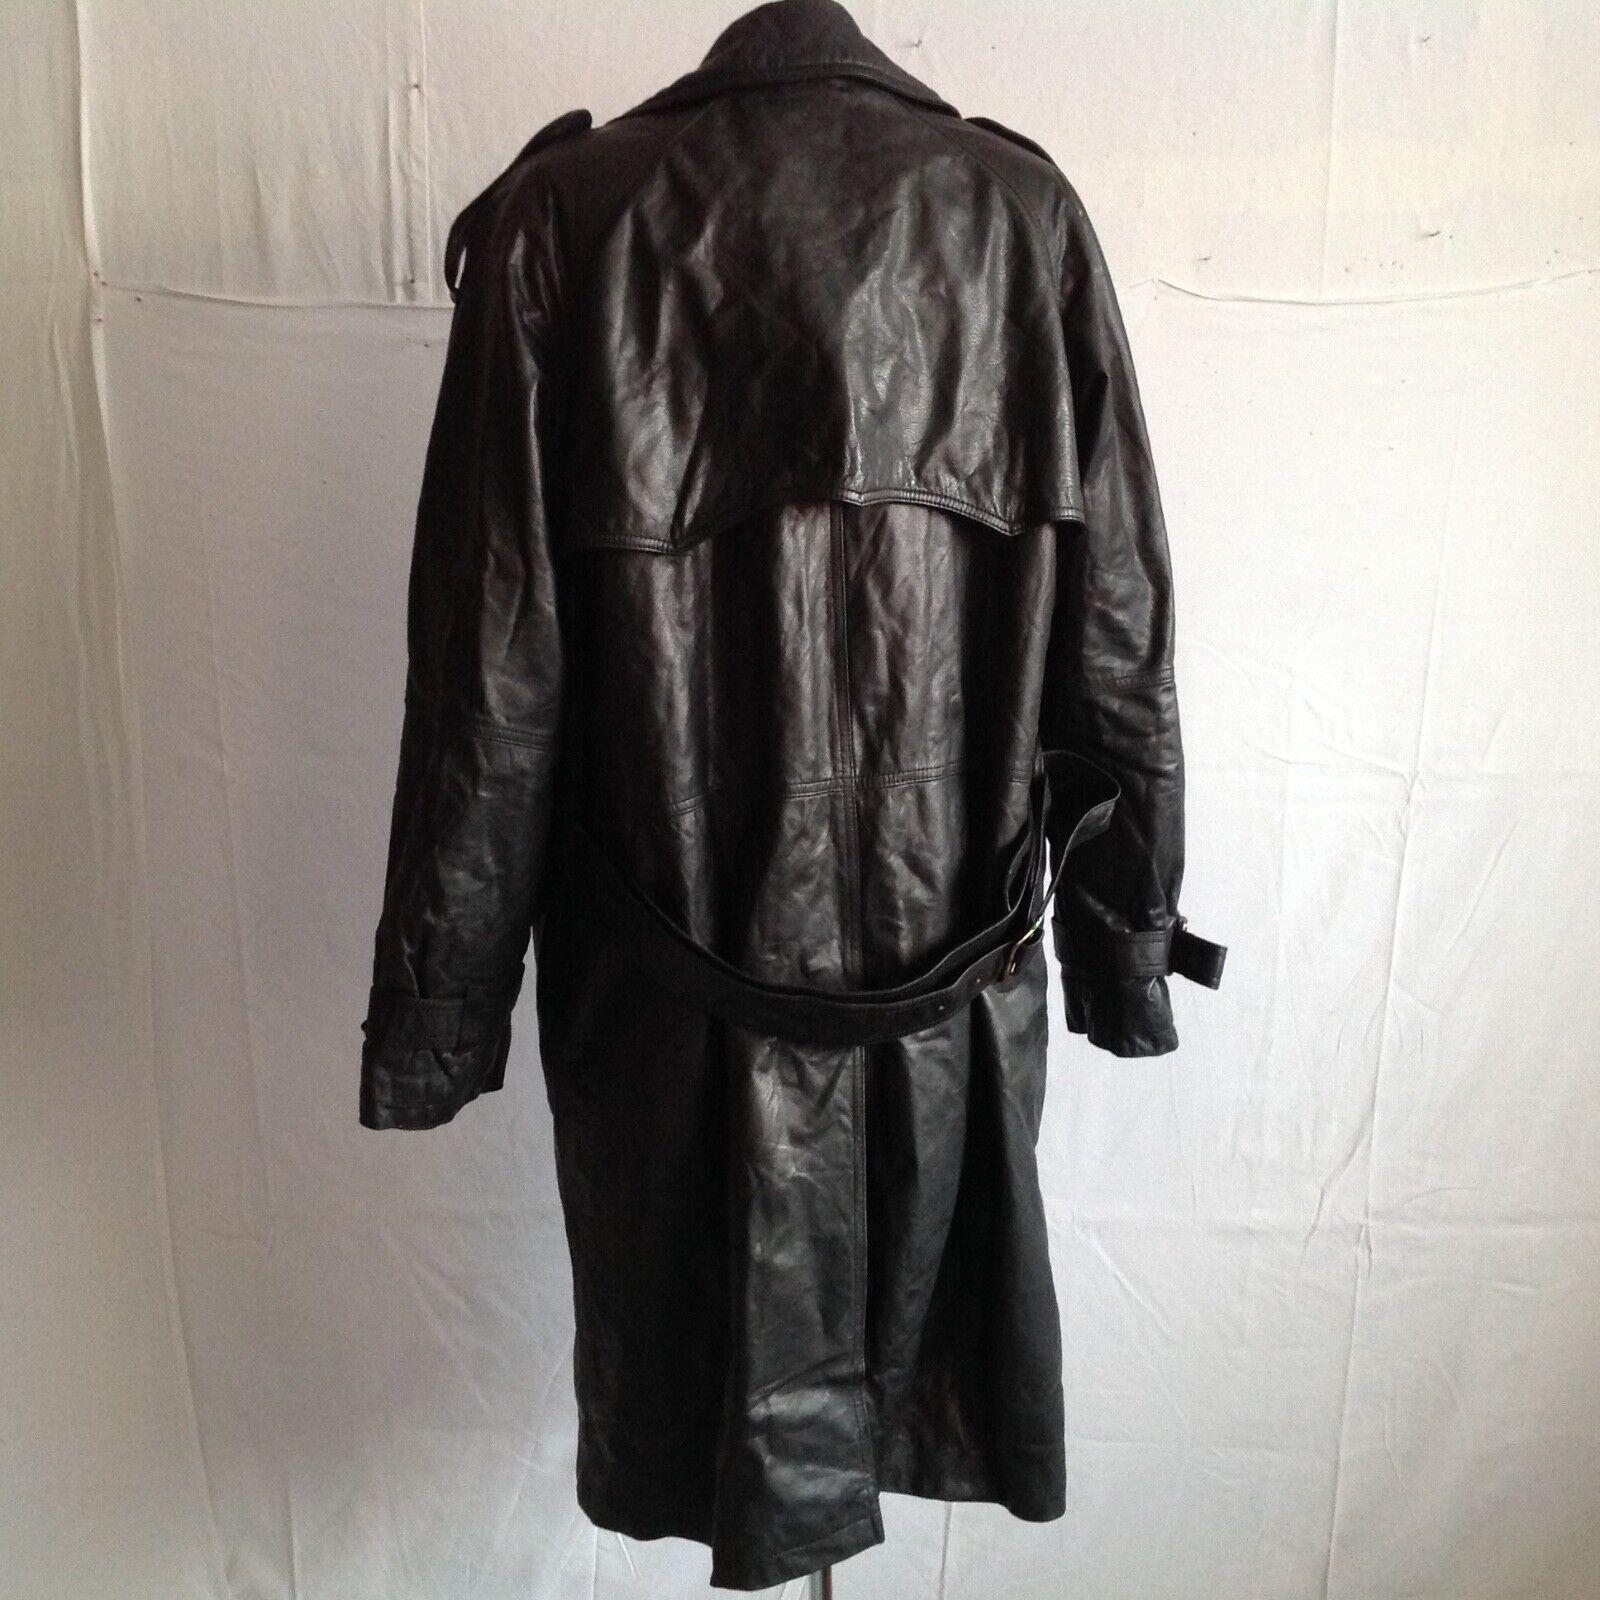 3b _  trench / manteau femme _ en cuir_ noir _t48 ( mf01/01/02-20p )